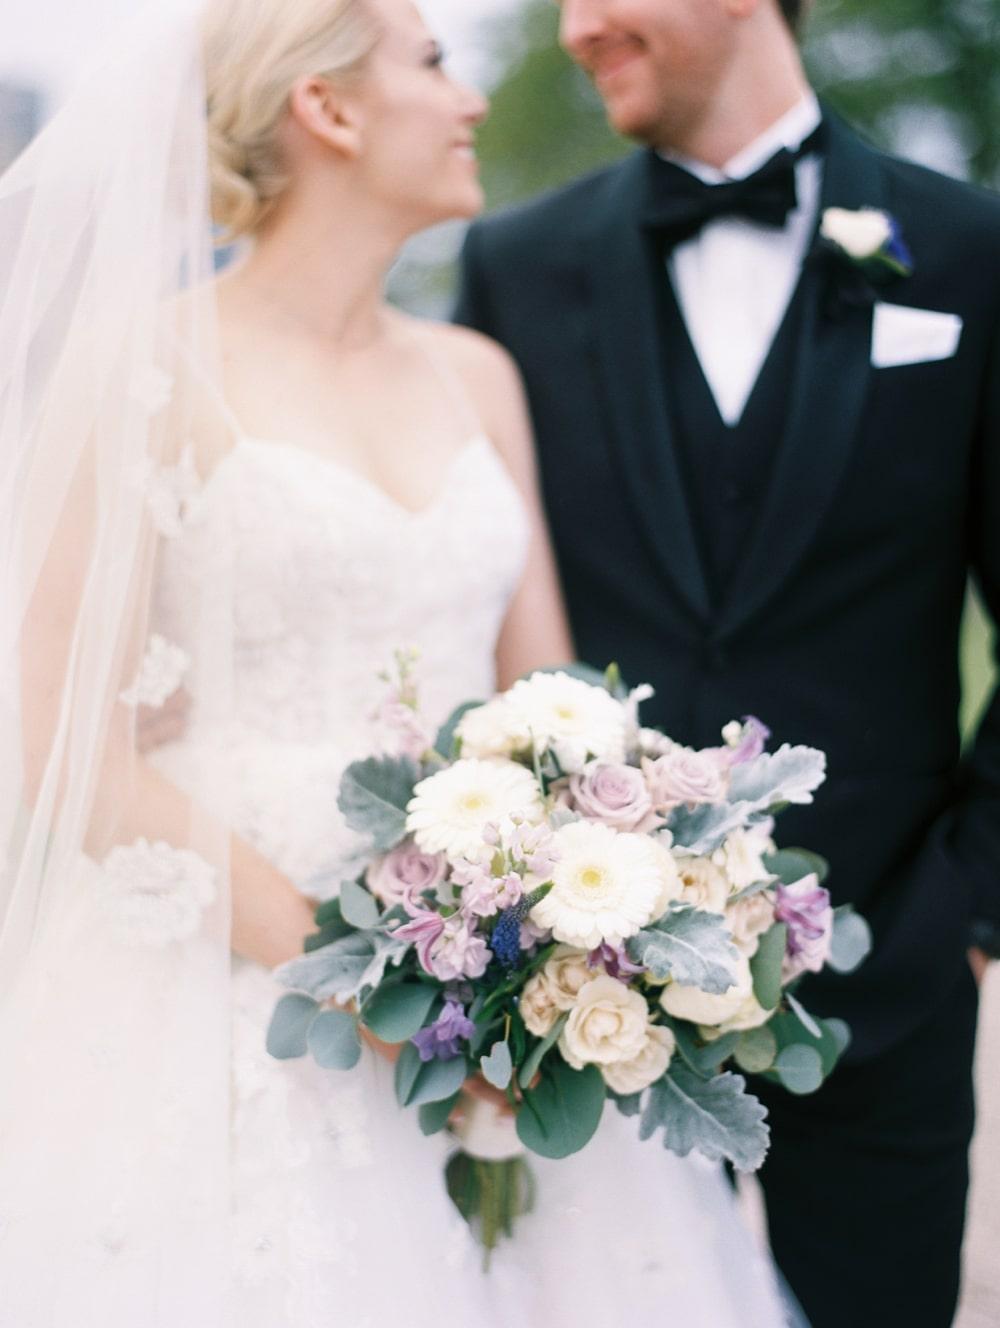 Kristin-La-Voie-Photography-salvatore's-chicago-wedding-photographer-24